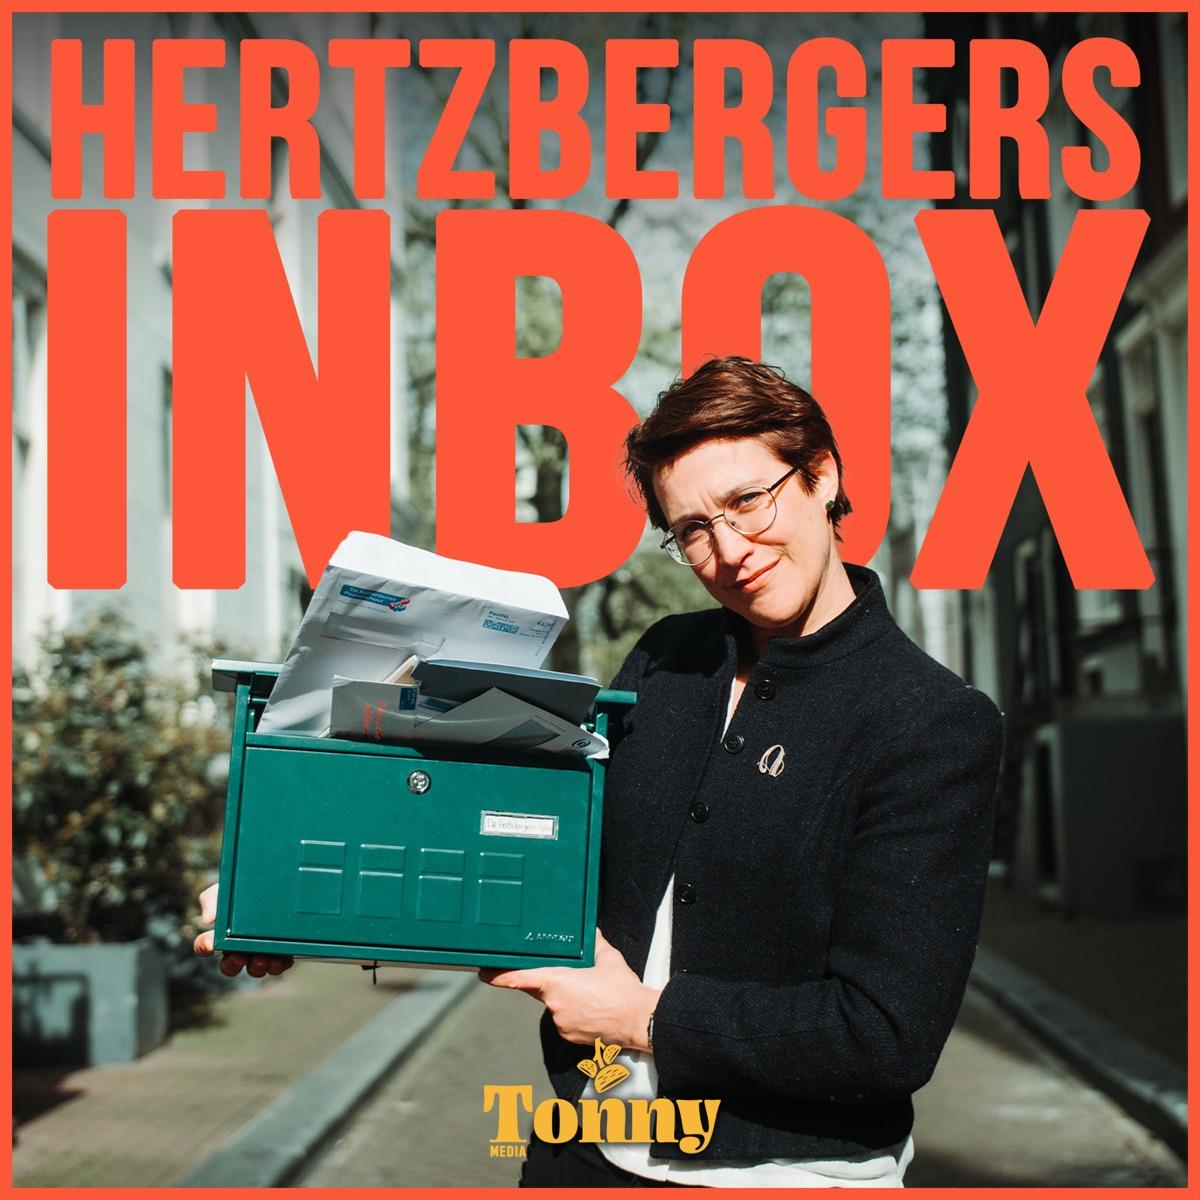 Hertzbergers Inbox